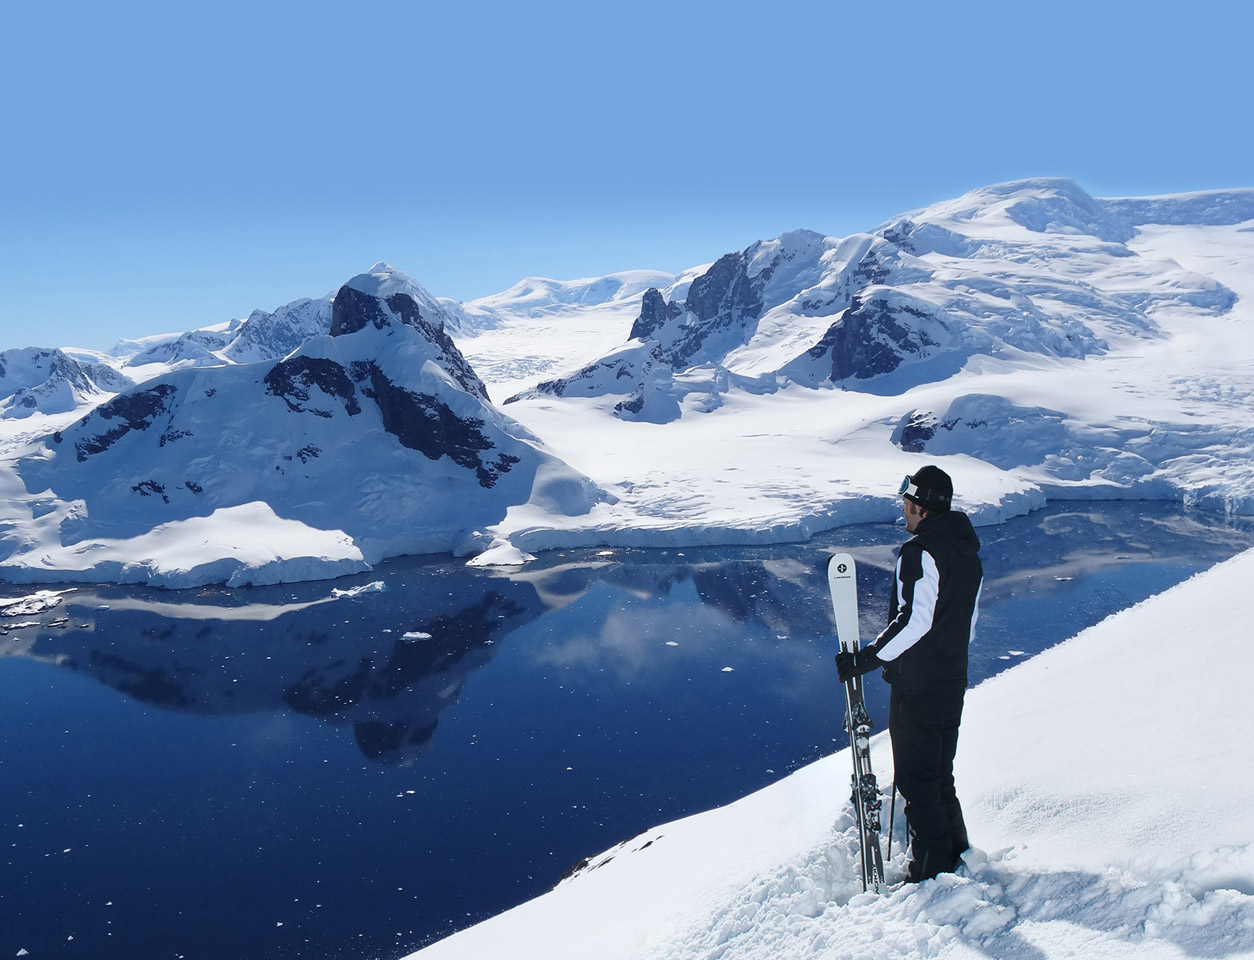 lacroix ski